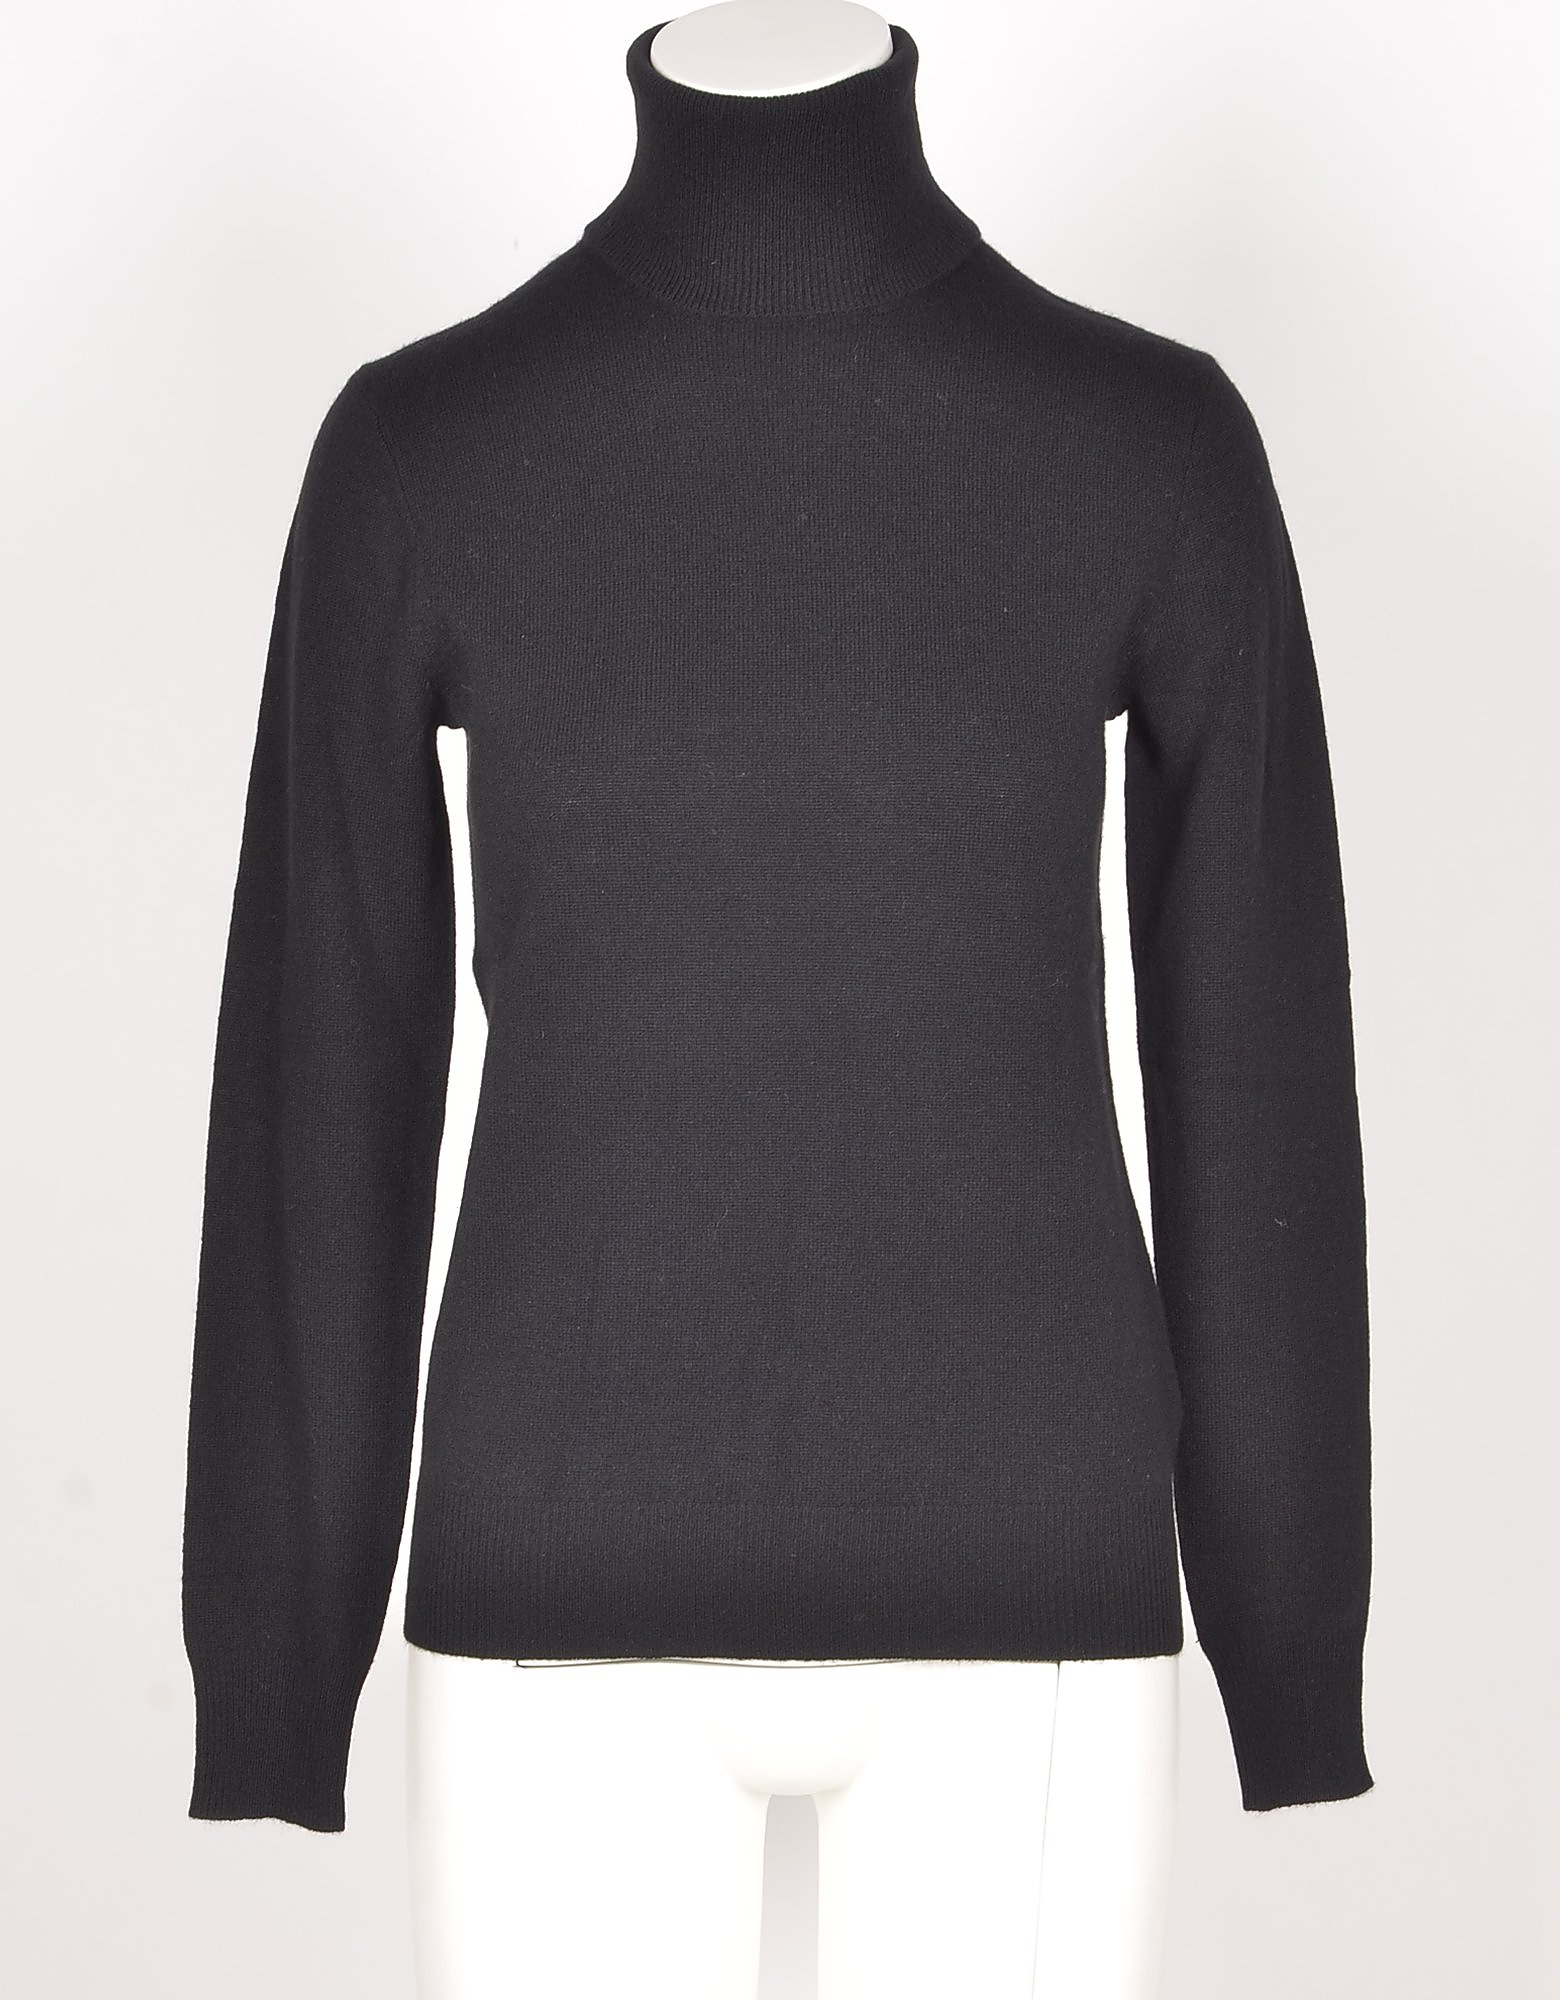 Ralph Lauren Designer Knitwear, Black Cashmere Turtleneck Women's Sweater